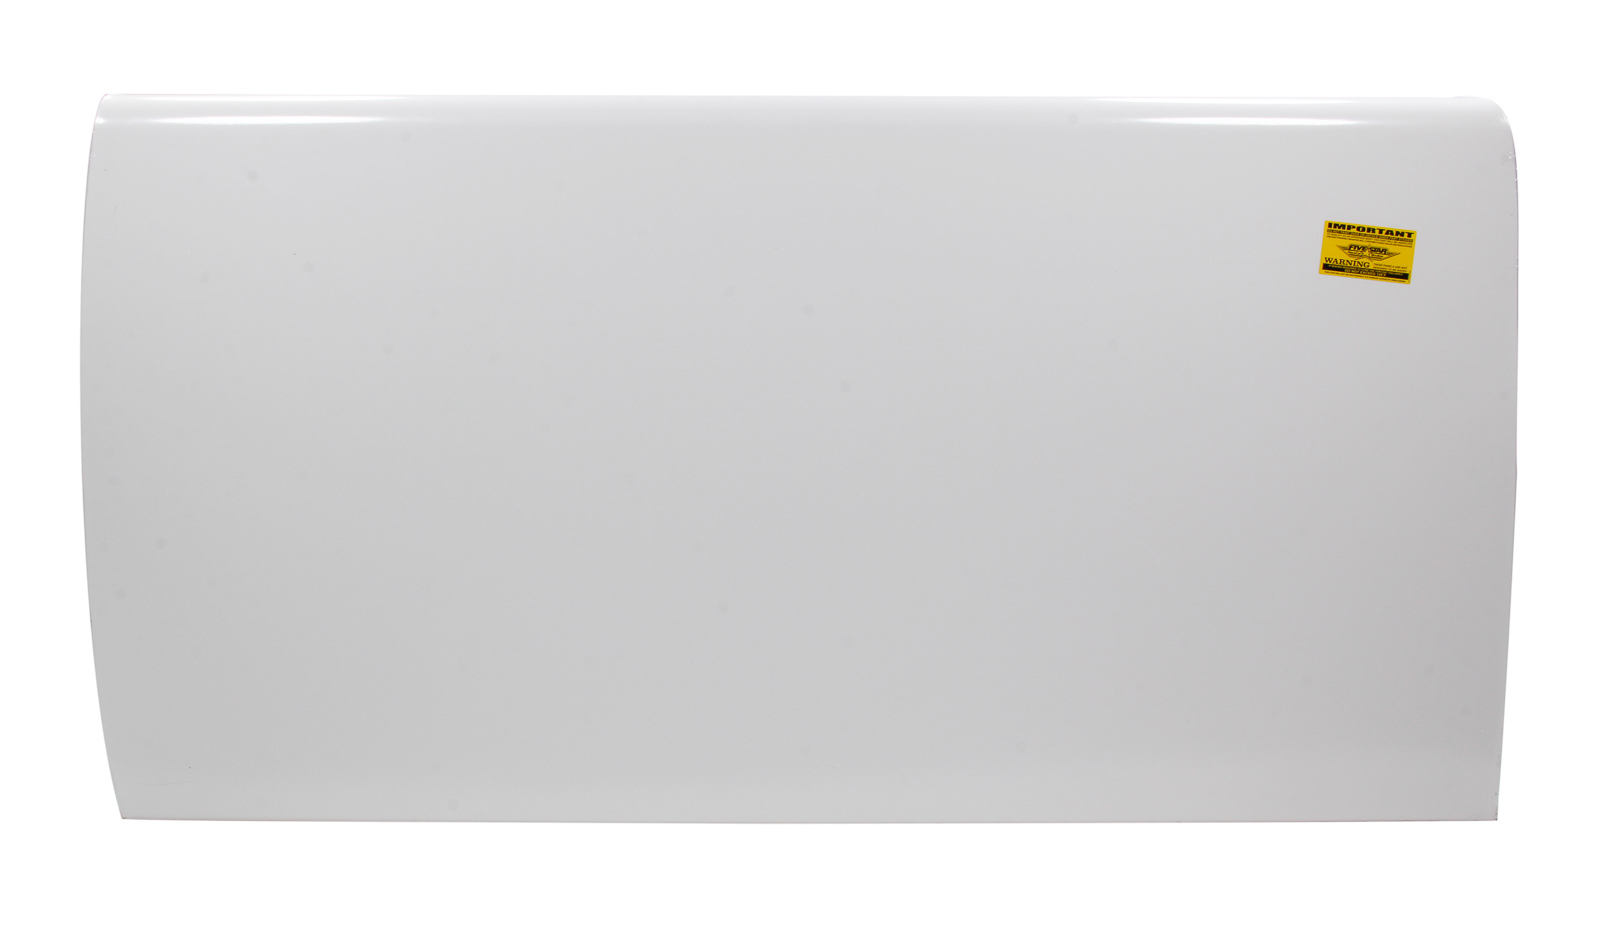 Fivestar 2019 LM Aluminum Door White Left